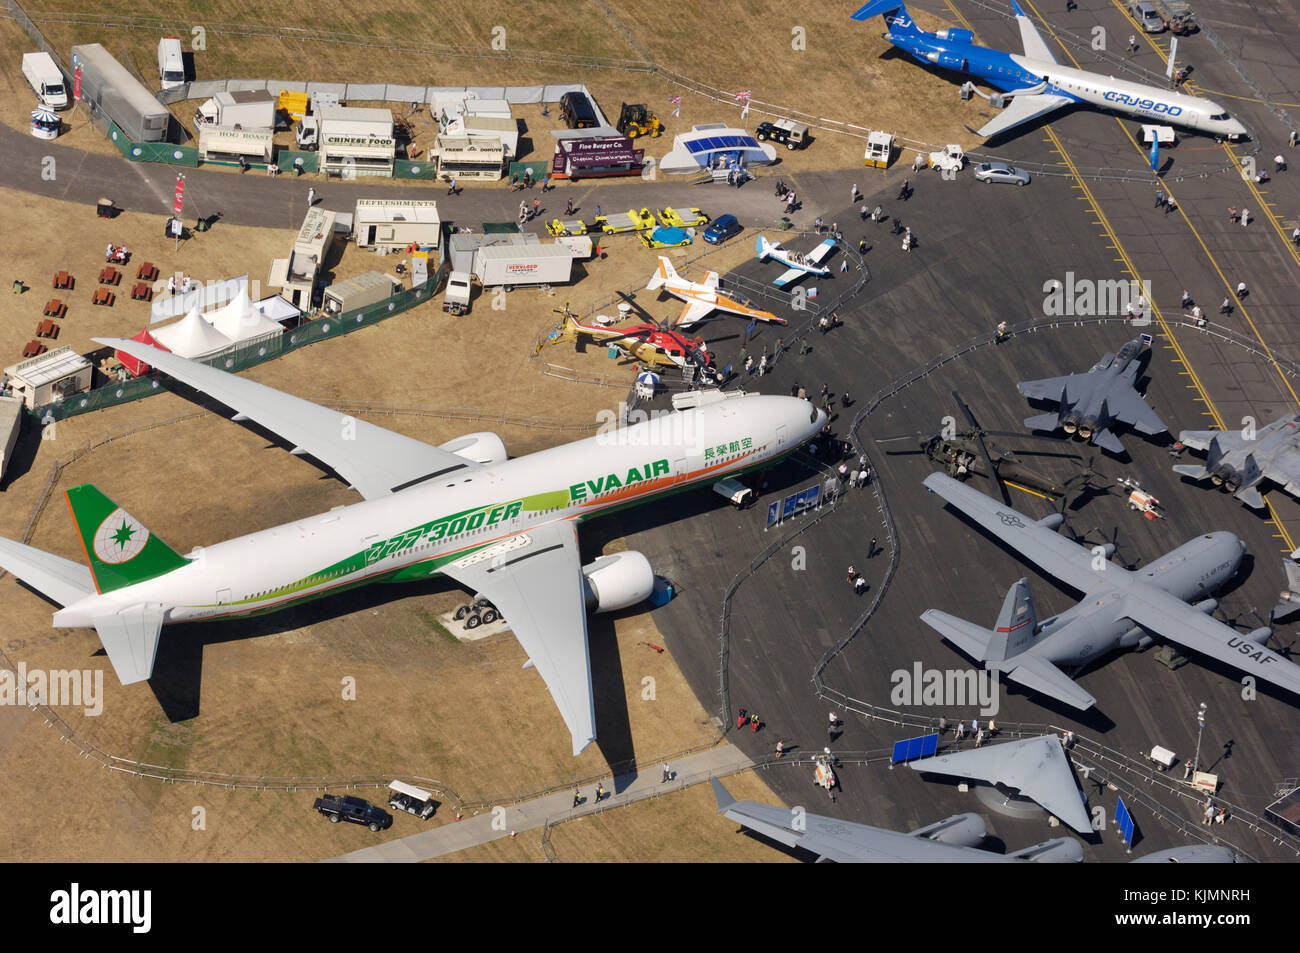 EVA Air Boeing 777-300ER, Bombardier CRJ-900 and USAF